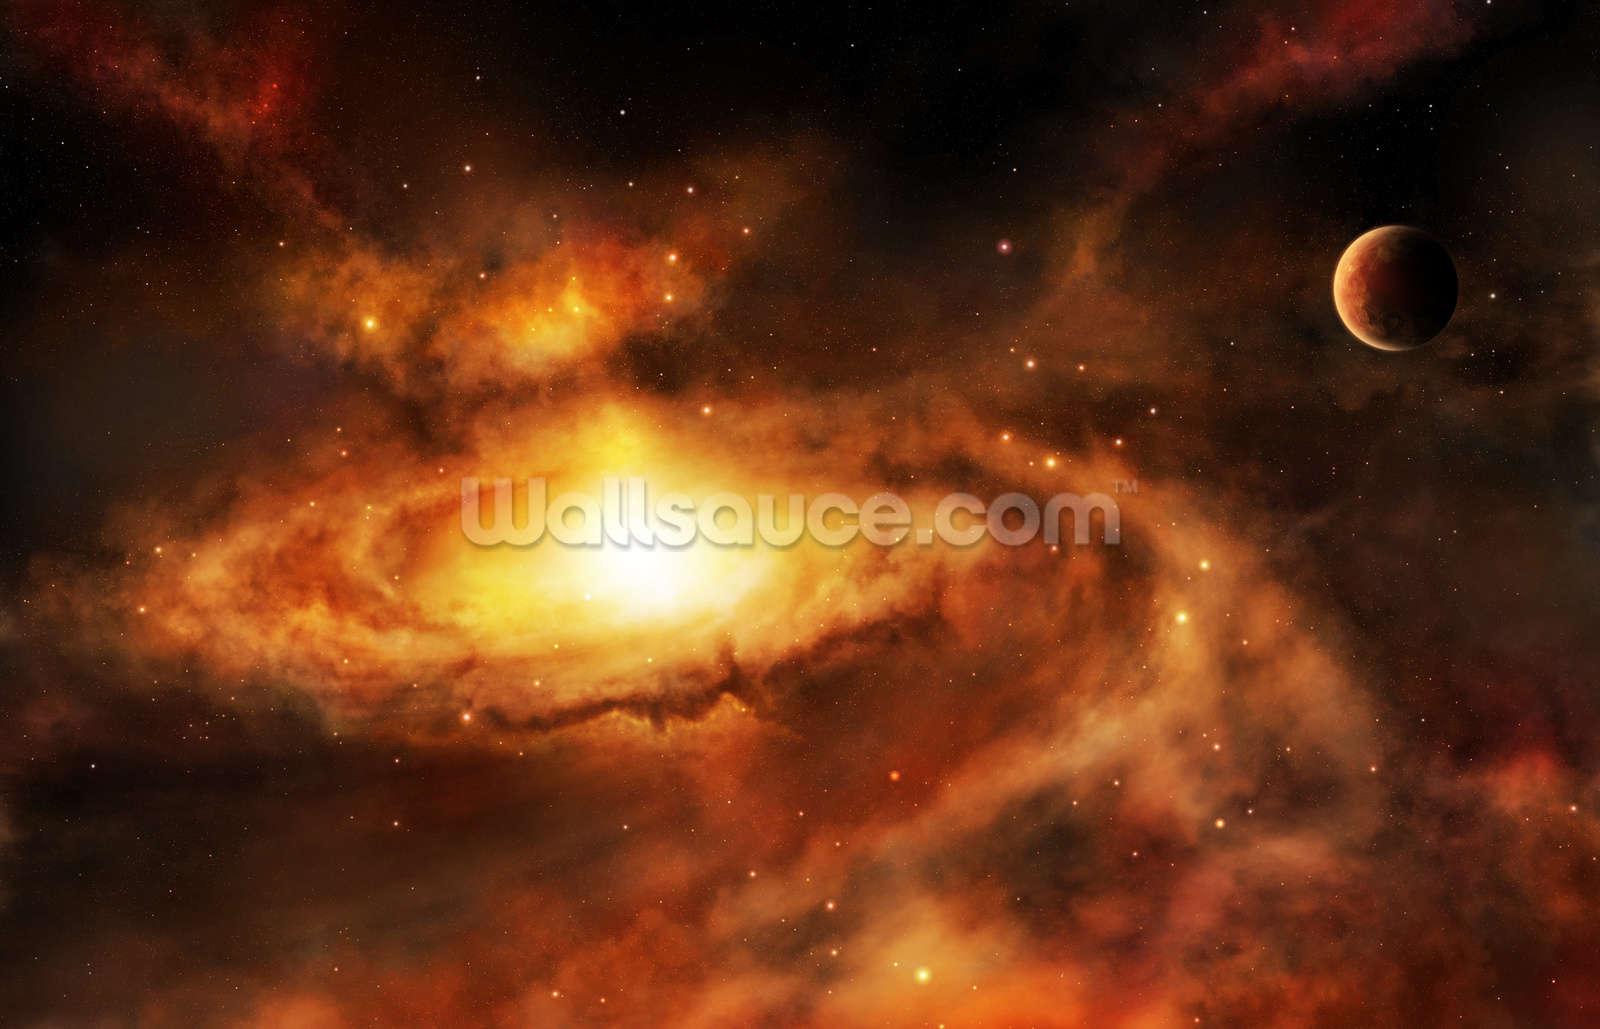 spiral galaxy nebula wallpaper wall mural | wallsauce uk